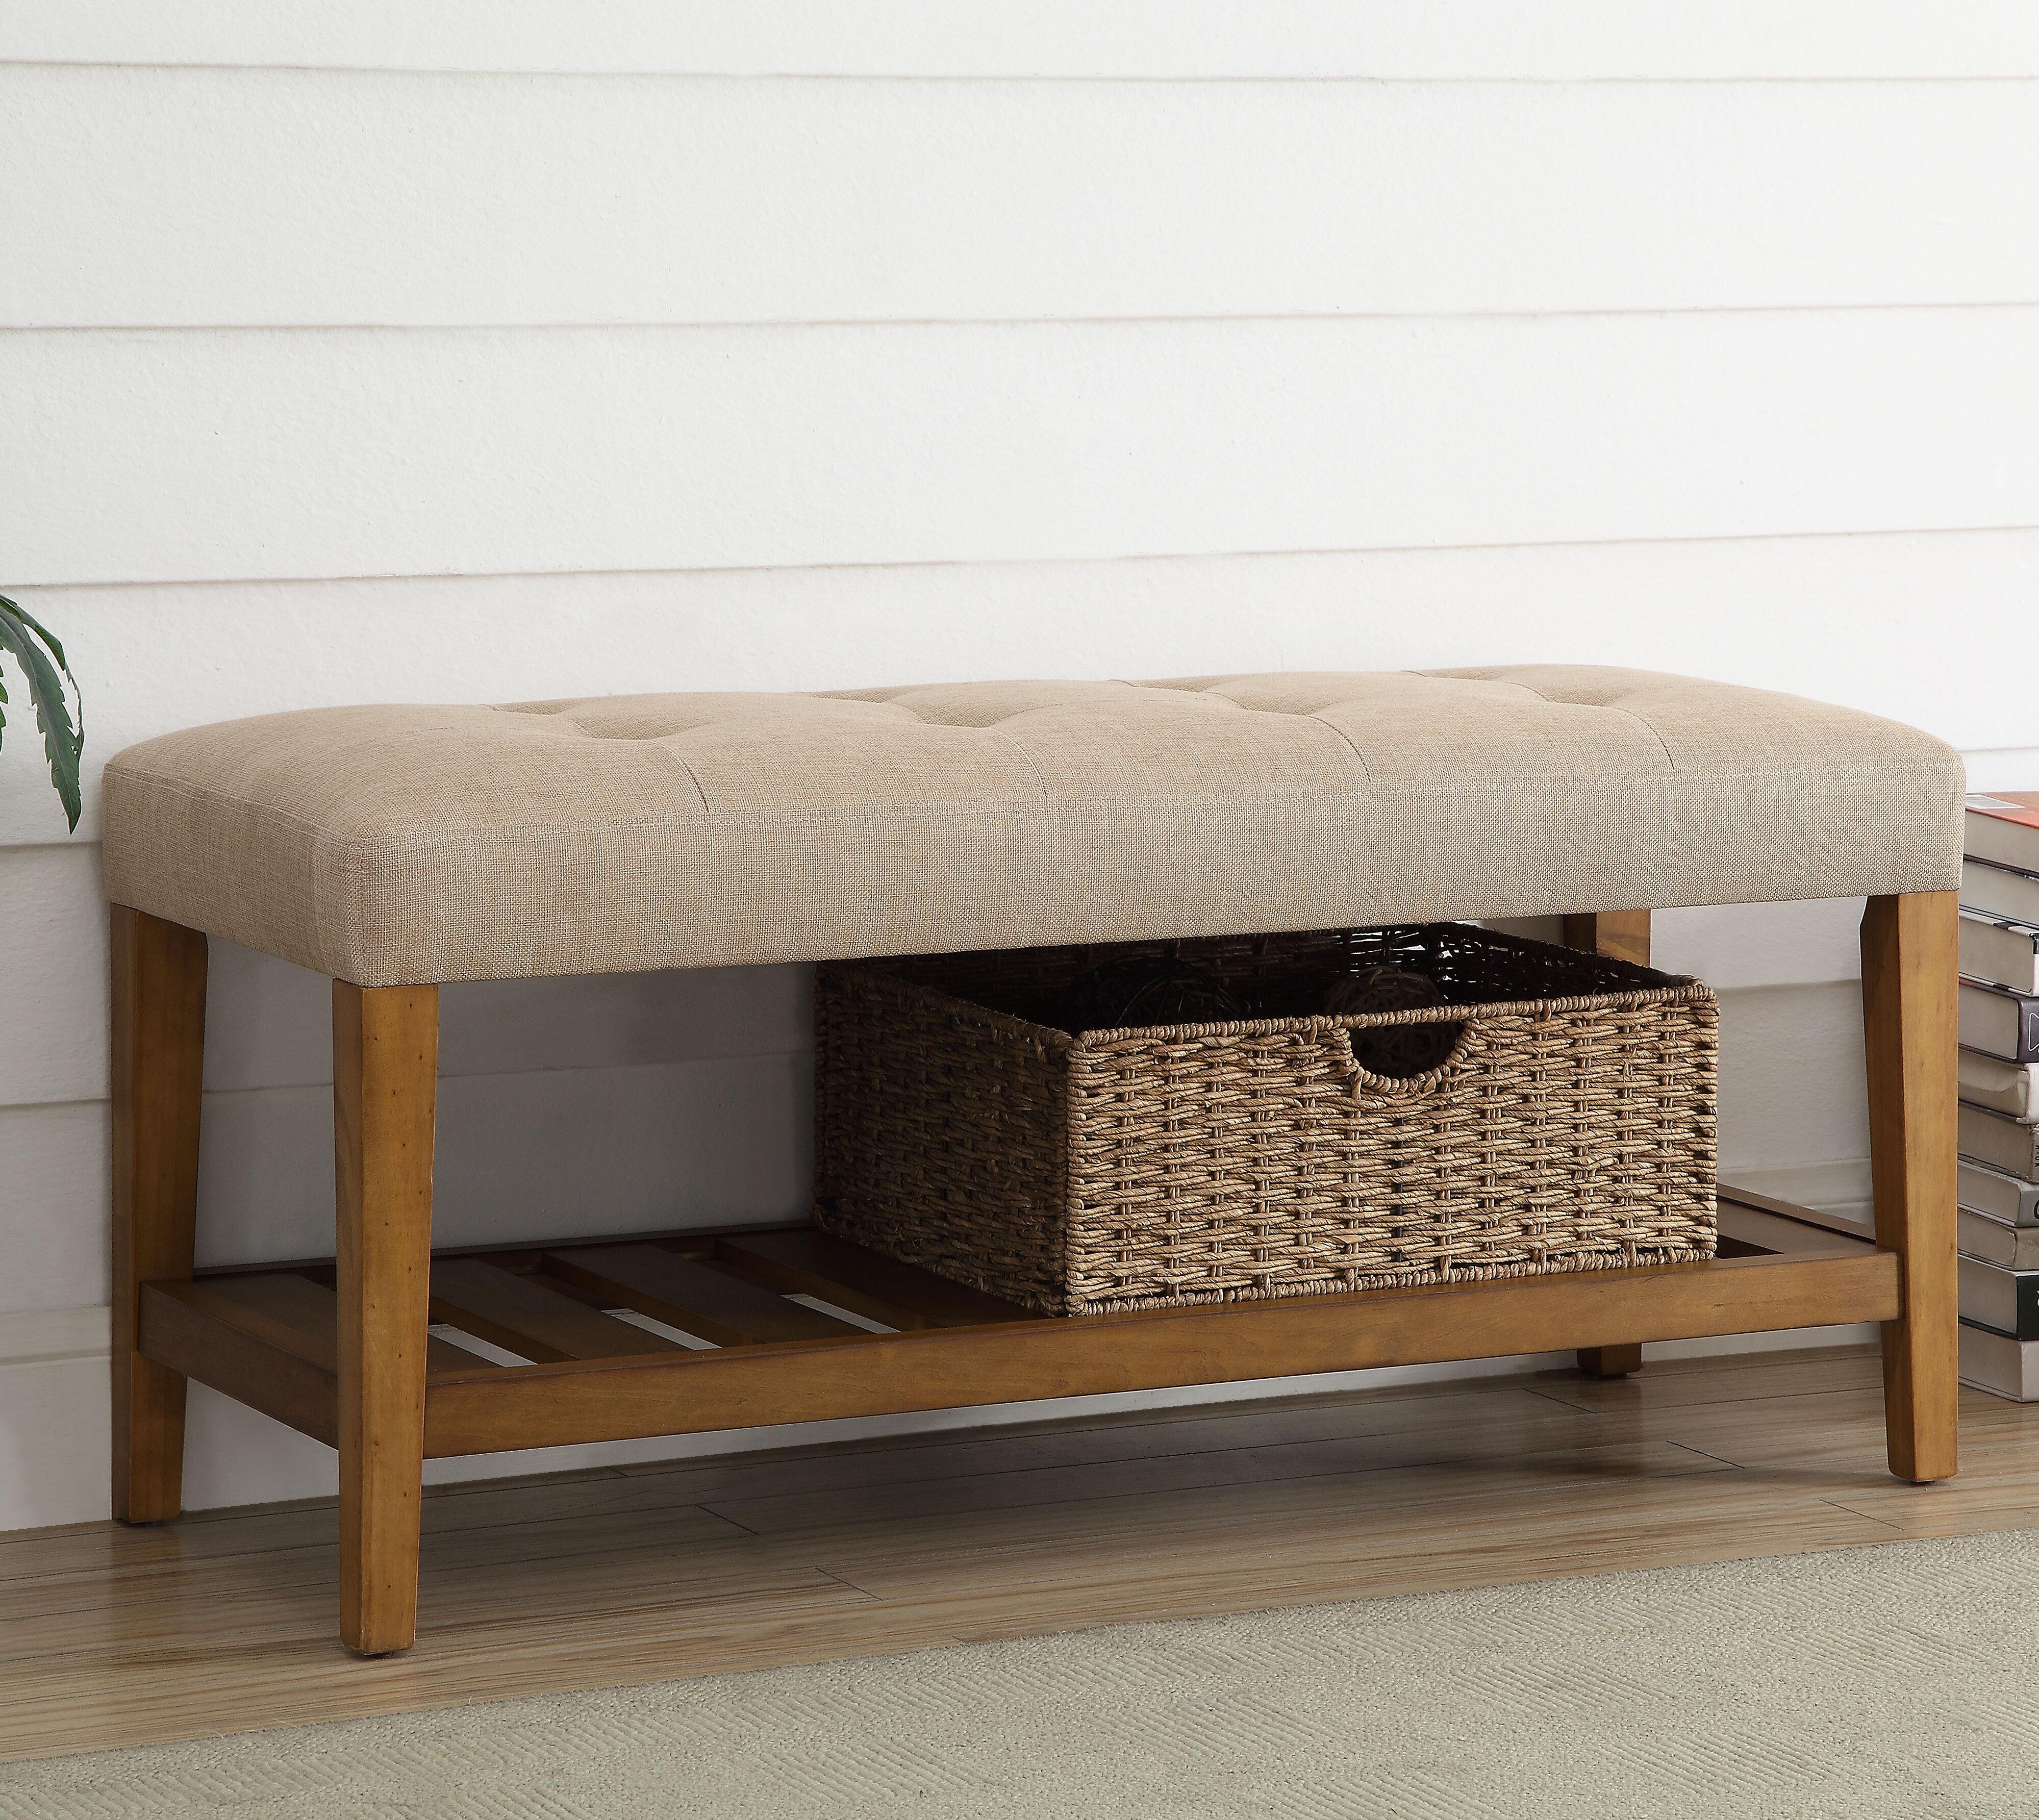 & Charlton Home Warwickshire Wood Storage Bench u0026 Reviews   Wayfair